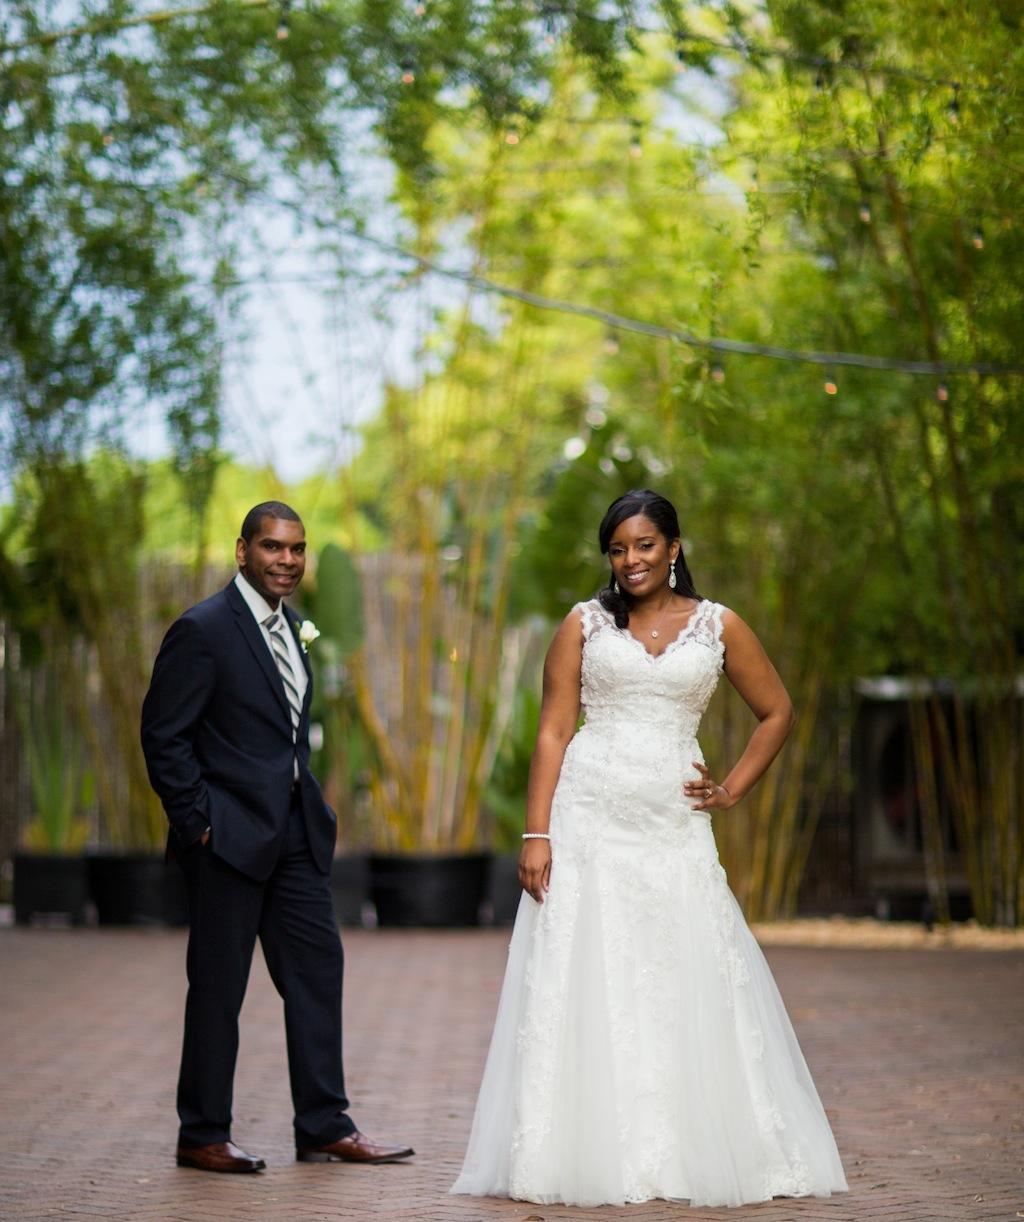 NOVA 535 Wedding - Midsummer Night's Dream Wedding in Downtown St. Pete by 28Pixels Photography (13)